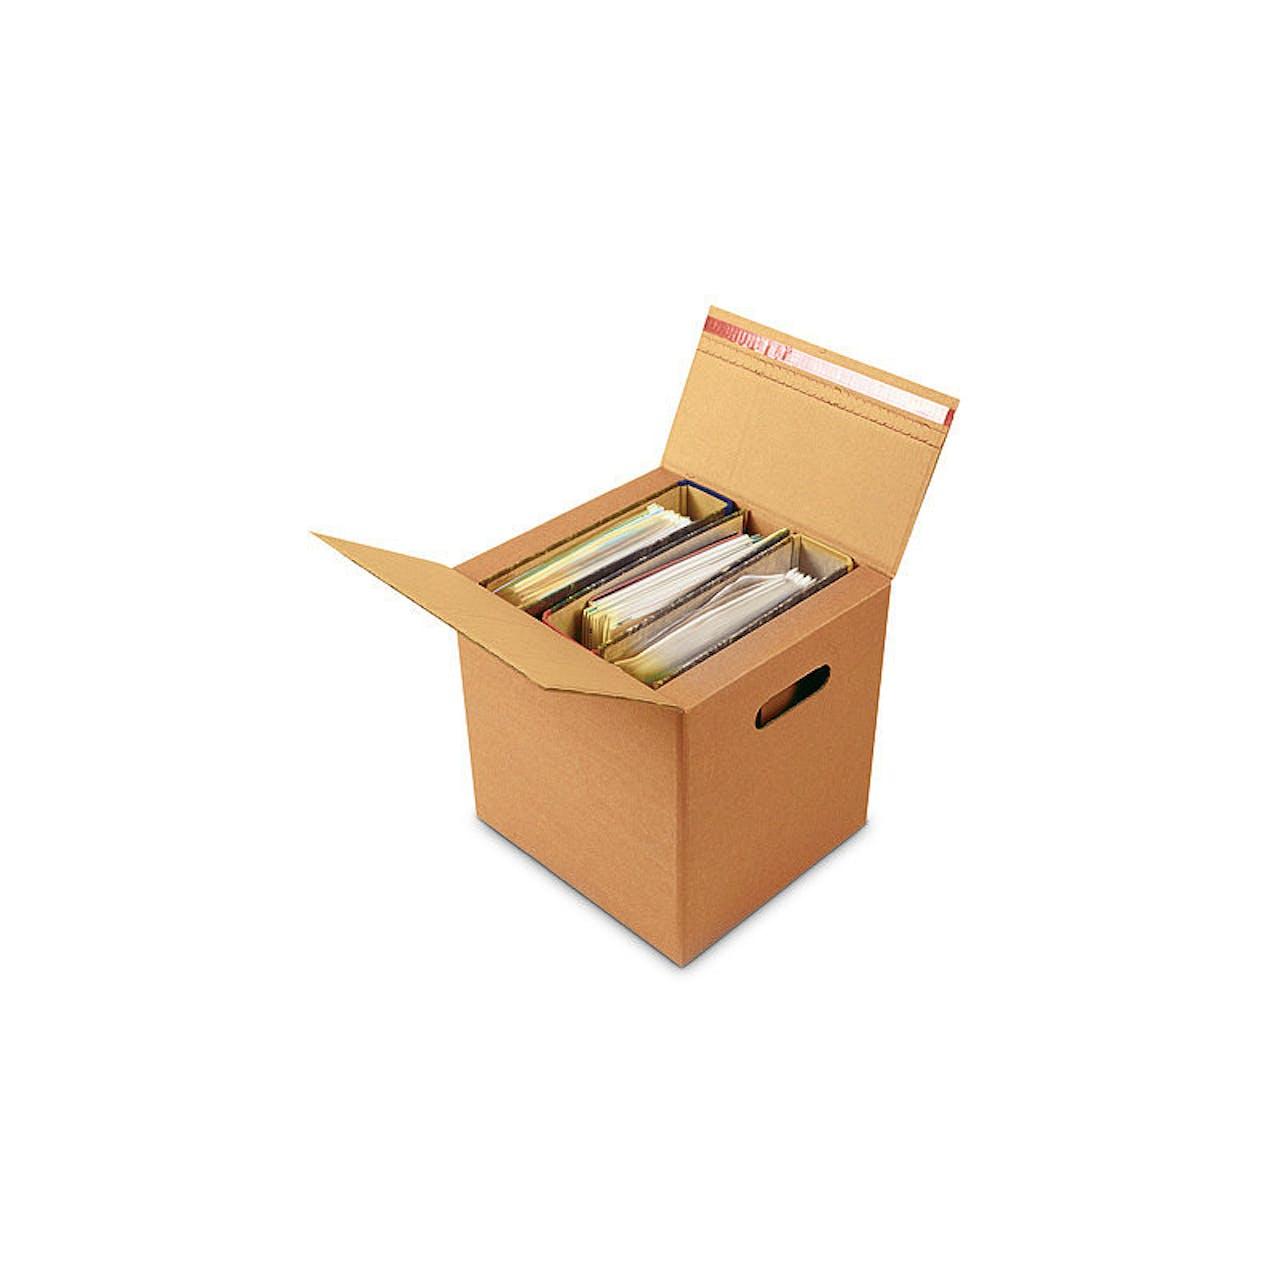 Ordner-Karton für 4–6 Ordner